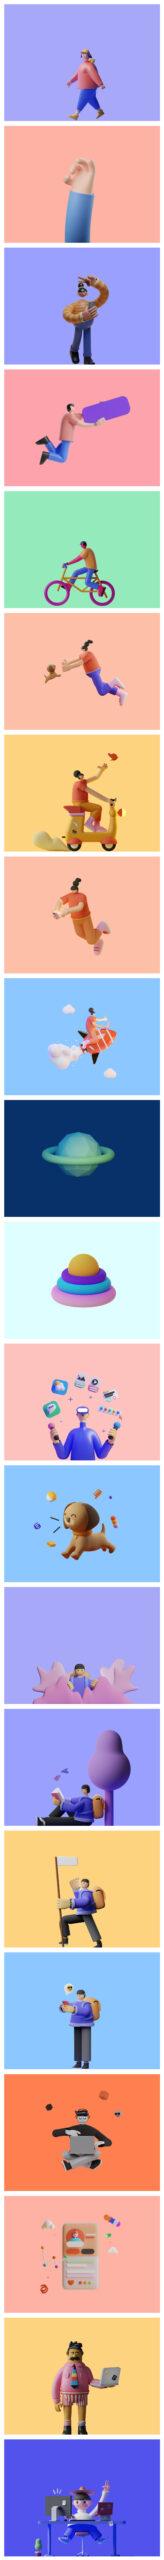 SALY-免费3D插画素材包插图